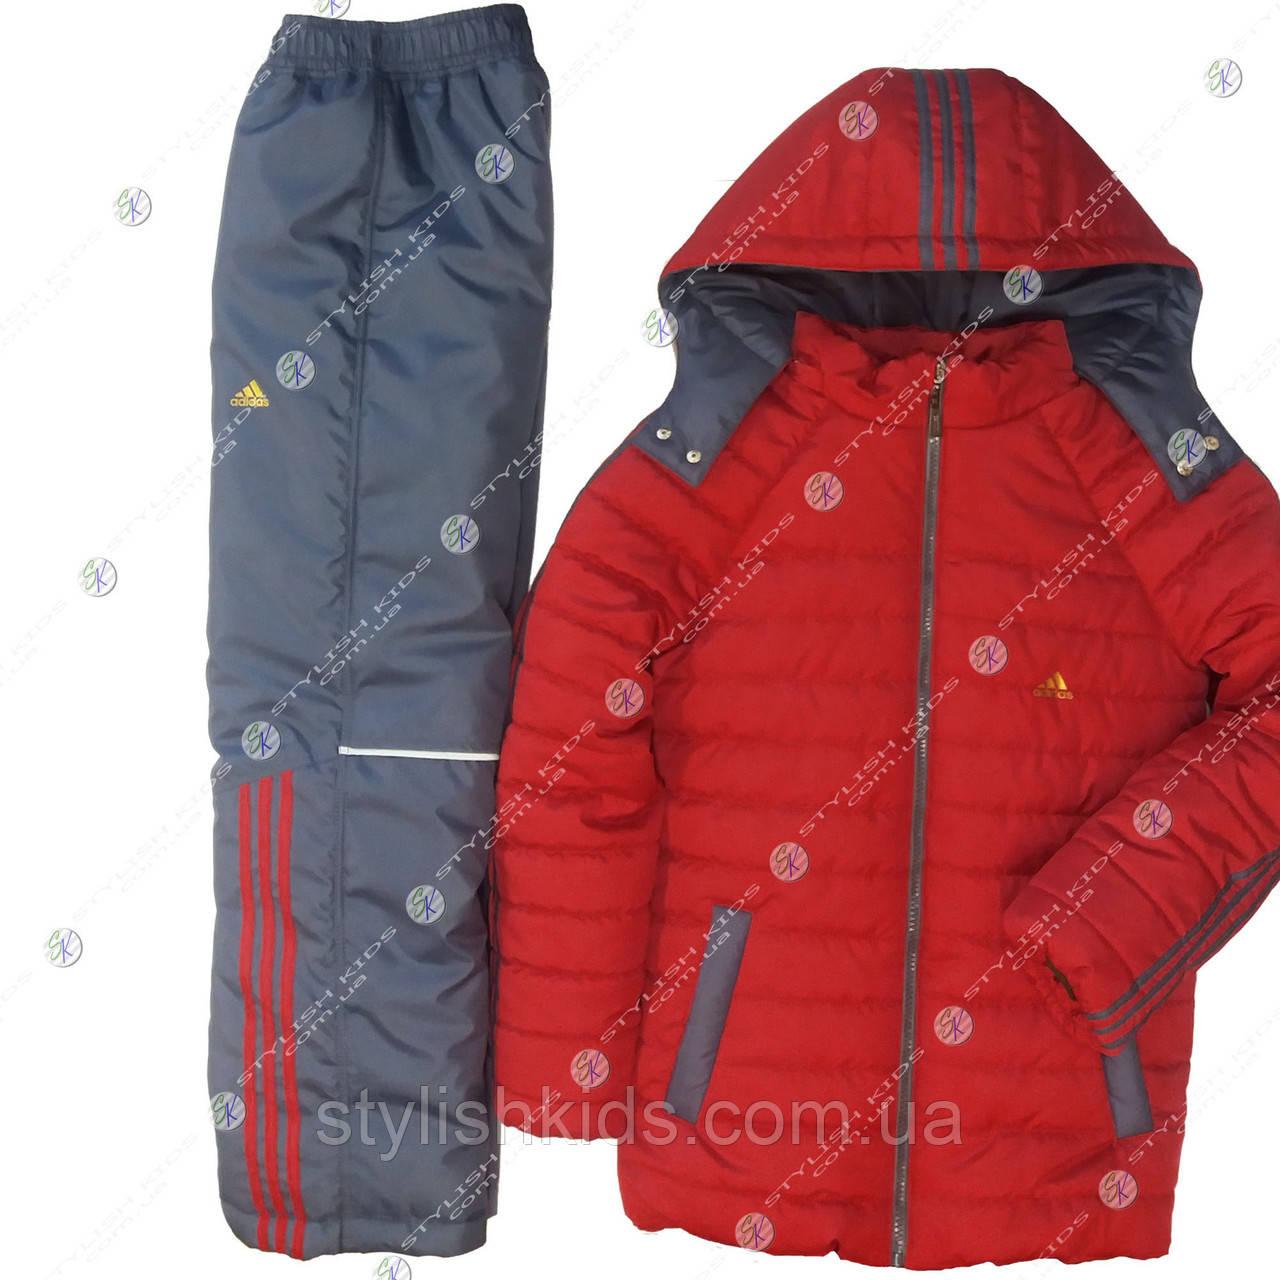 Зимний костюм адидас подростковый 128р-158р в интернет магазине.Купить  зимний спортивный костюм . bc2318f8f8b